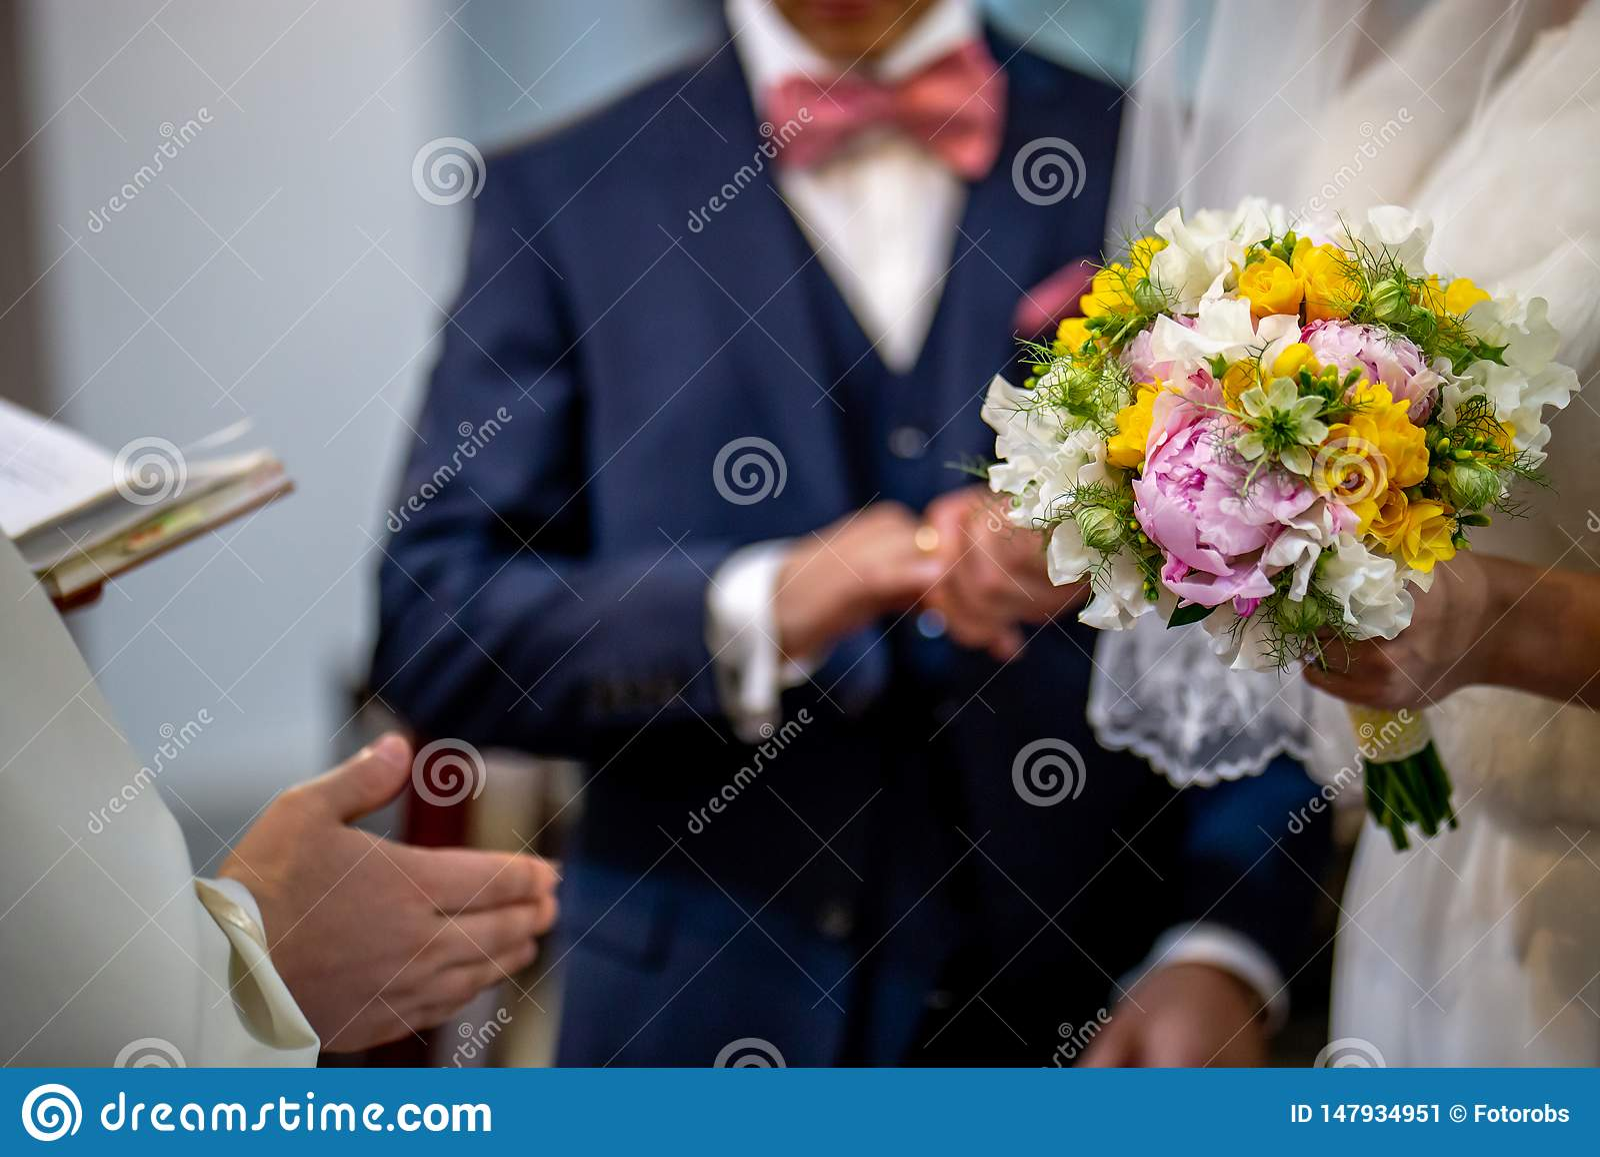 Ramo de flores en la mano de la novia durante la ceremonia de matrimonio